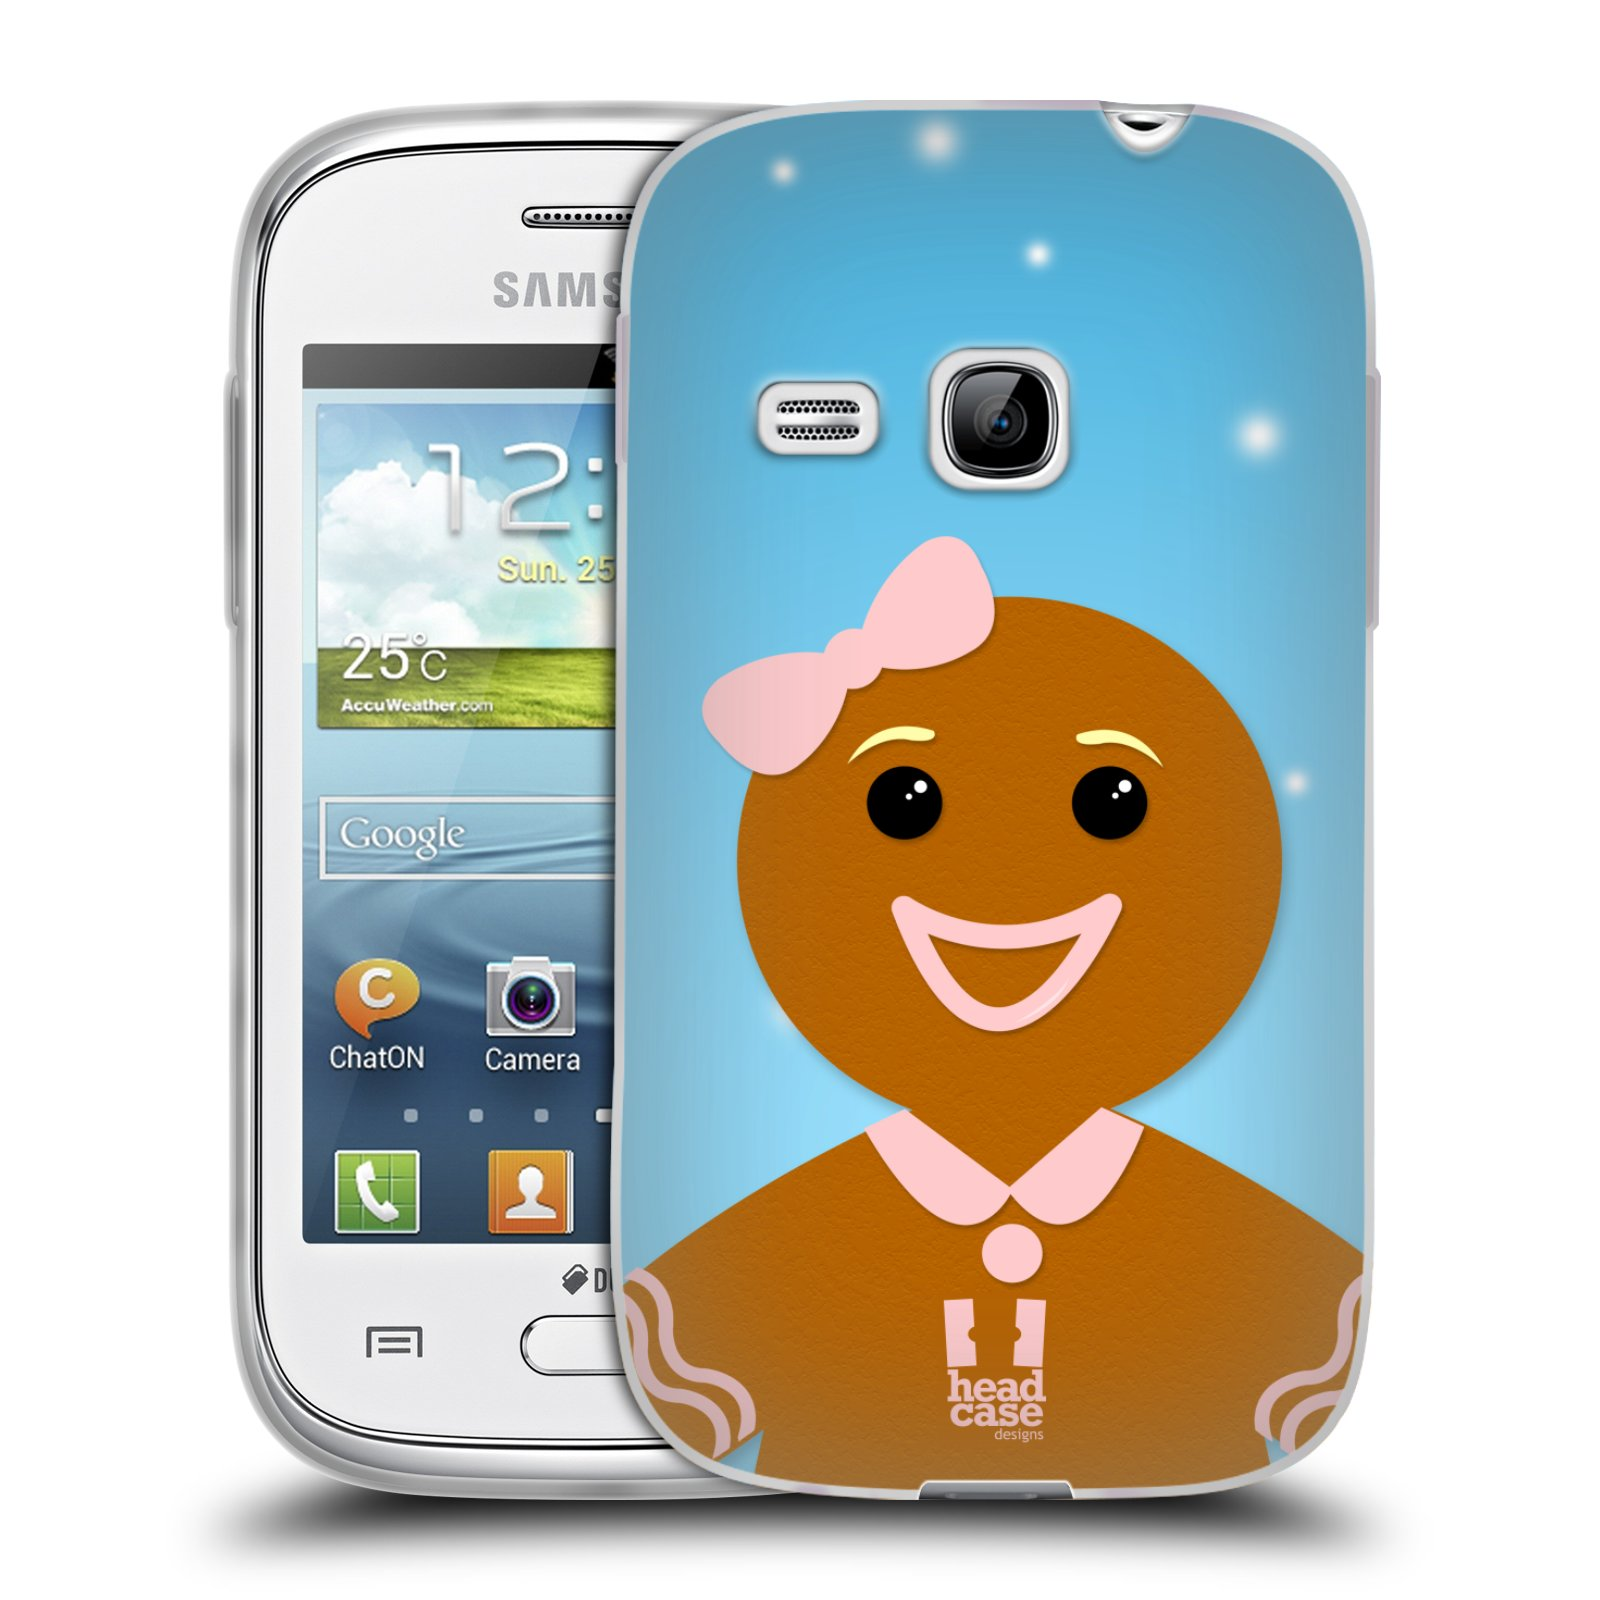 Silikonové pouzdro na mobil Samsung Galaxy Young HEAD CASE VÁNOCE PERNÍČEK (Silikonový kryt či obal na mobilní telefon Samsung Galaxy Young GT-S6310)